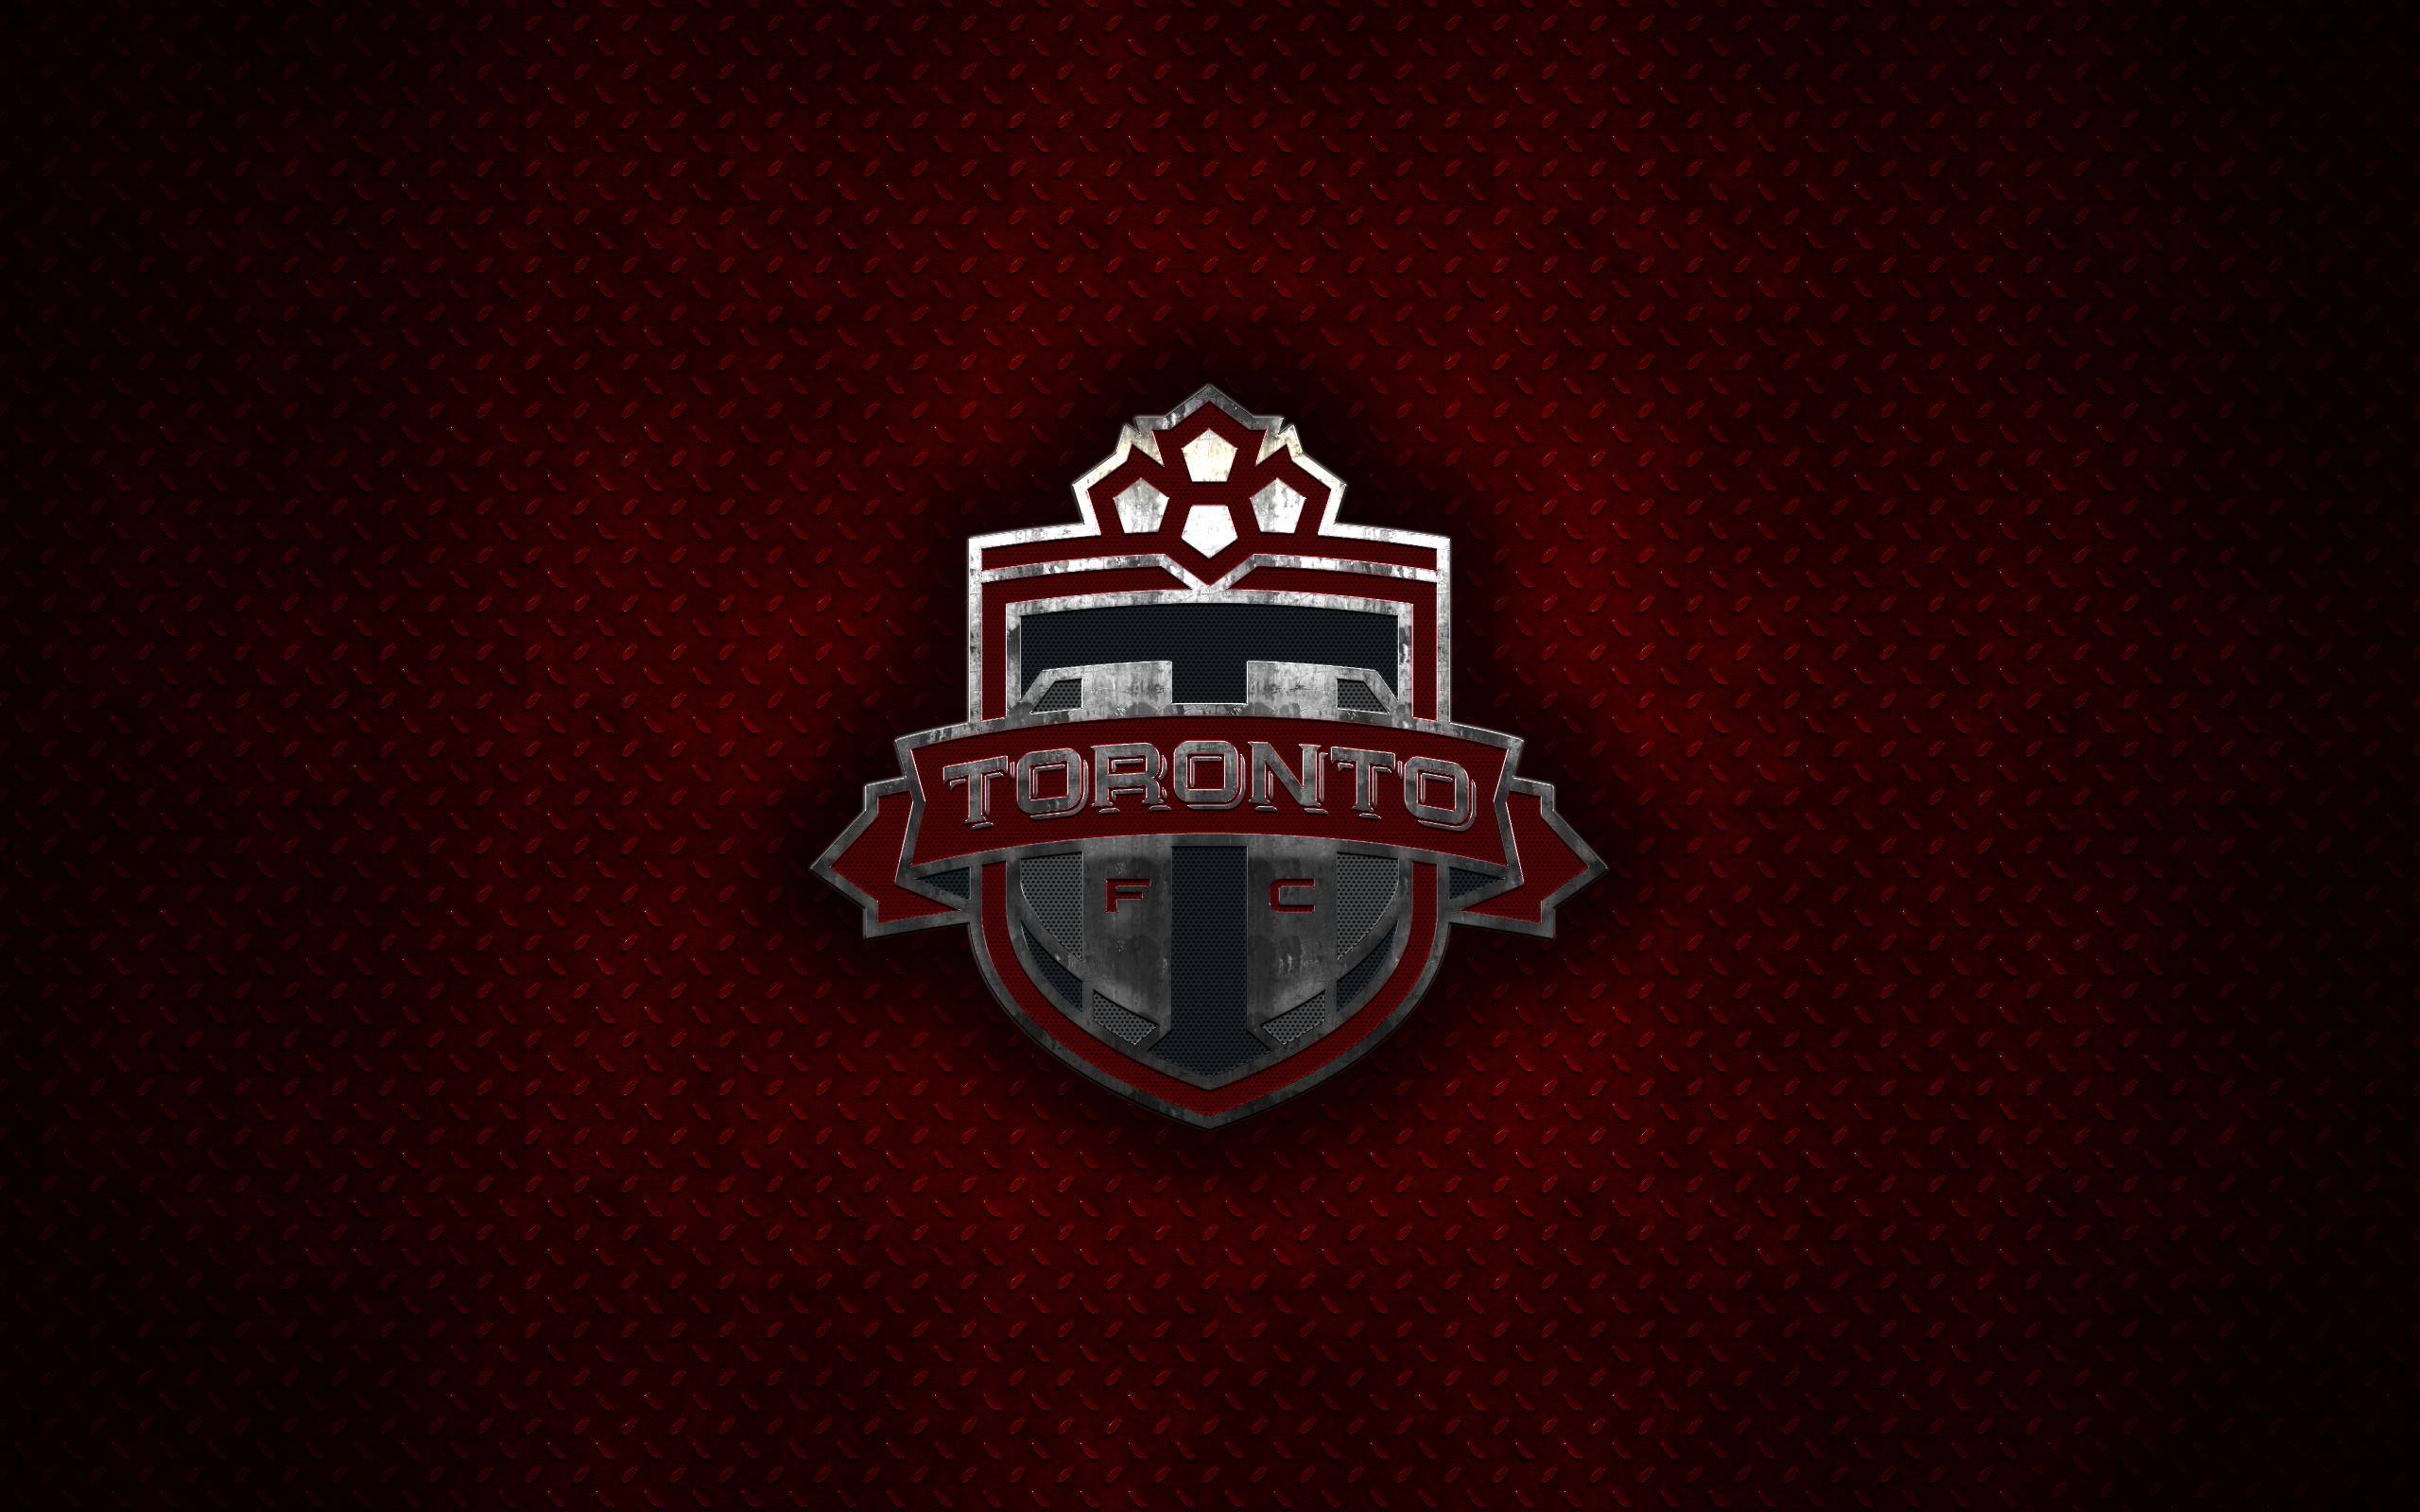 Toronto FC HD Wallpaper Background Image 2560x1600 ID988816 2560x1600